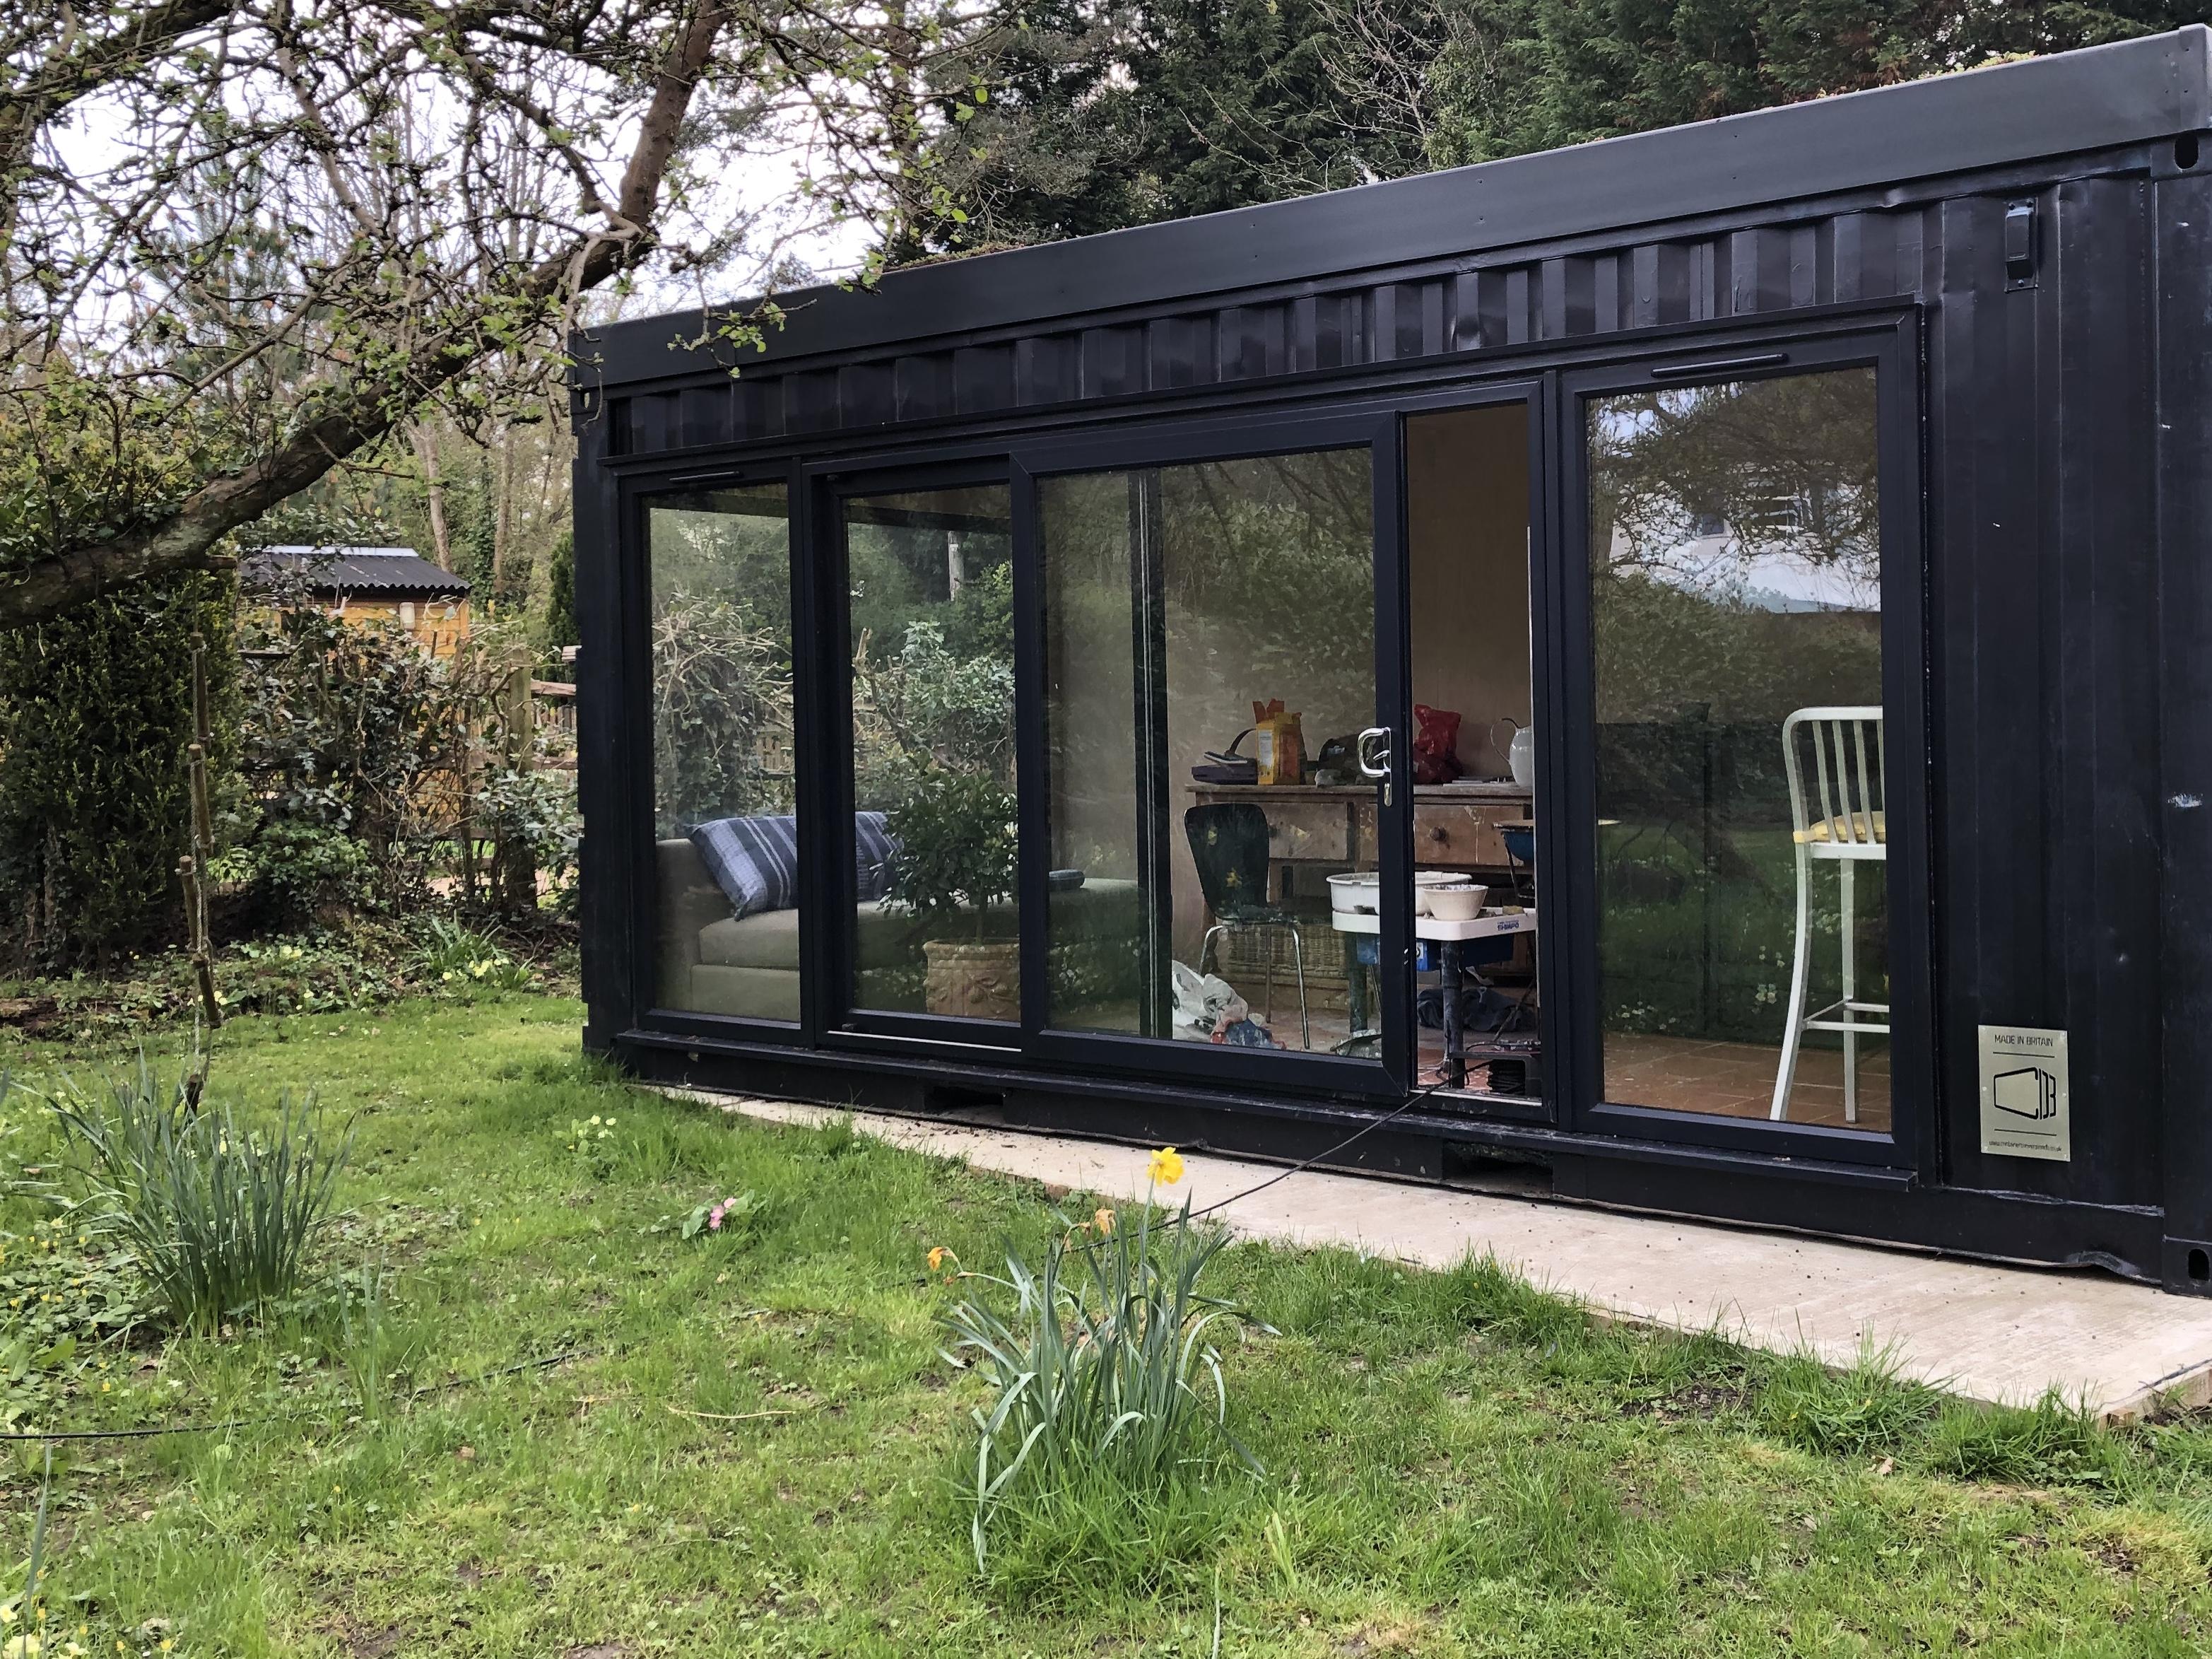 Garden room ideas 9 modern designs for all garden sizes, and ...